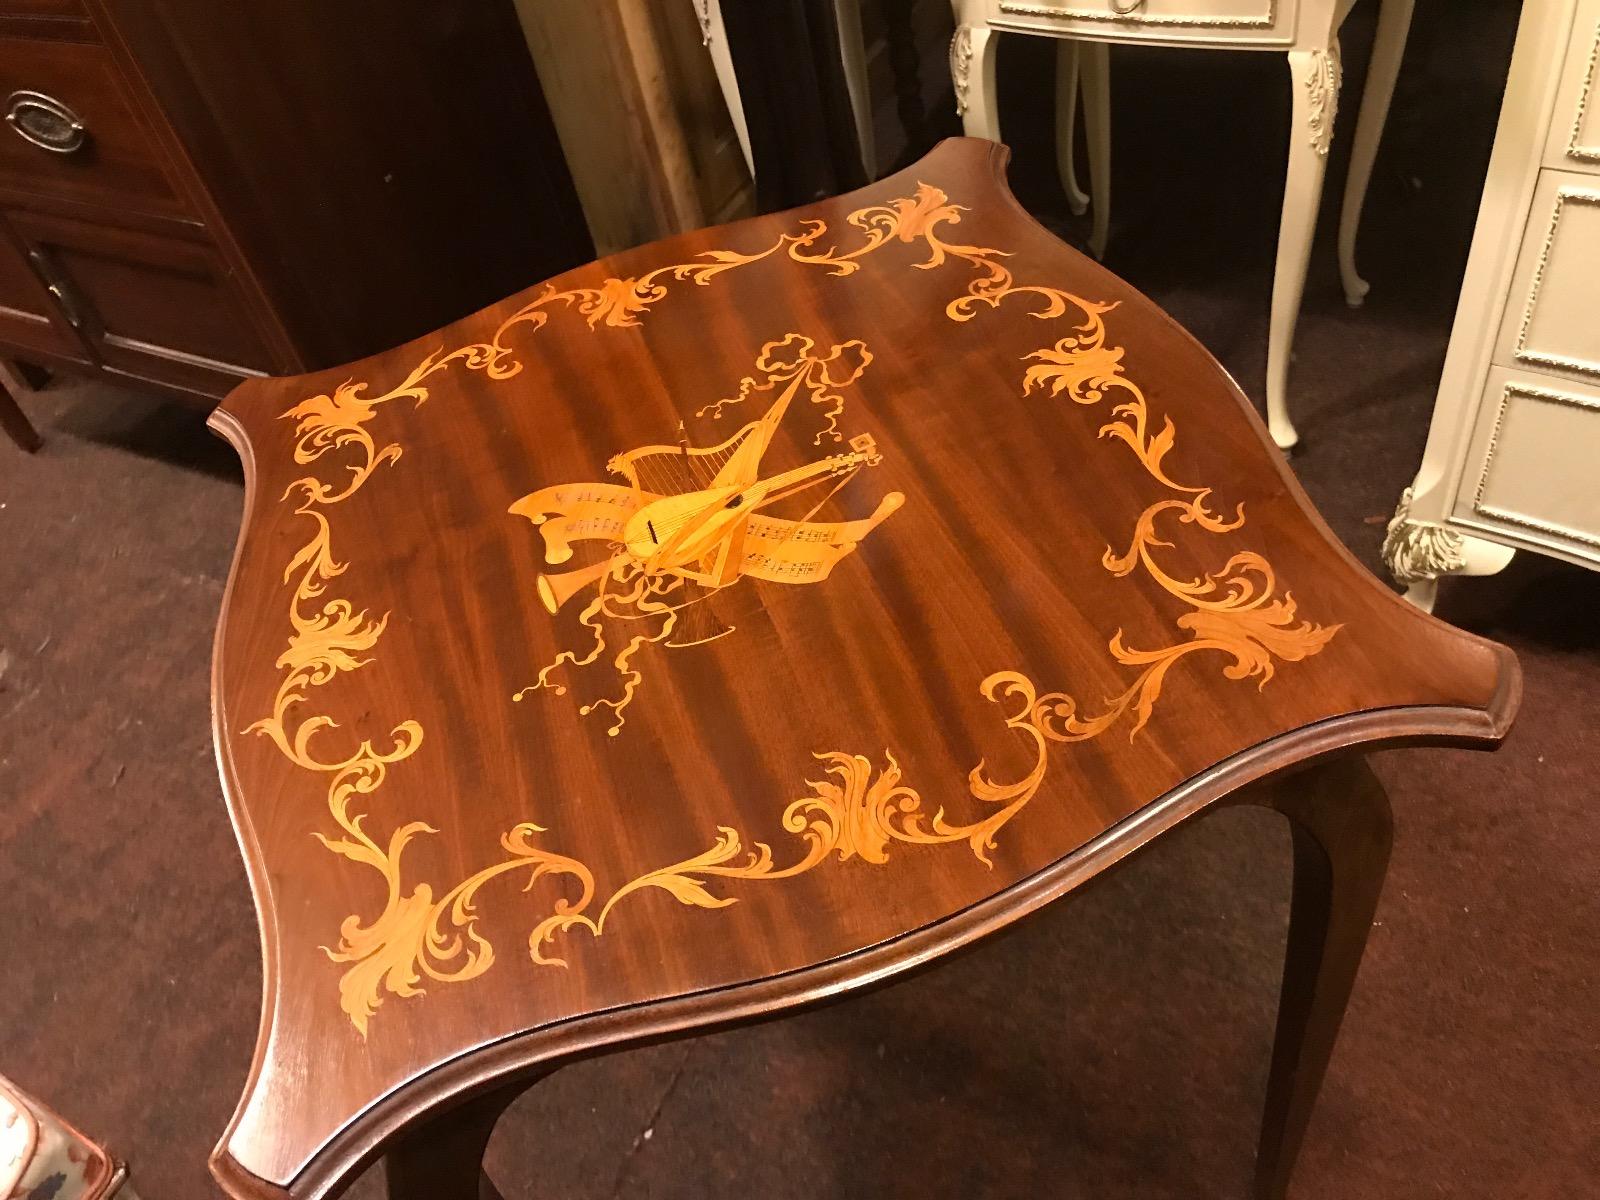 Music Satinwood Inlaid Mahogany Table (1 of 1)